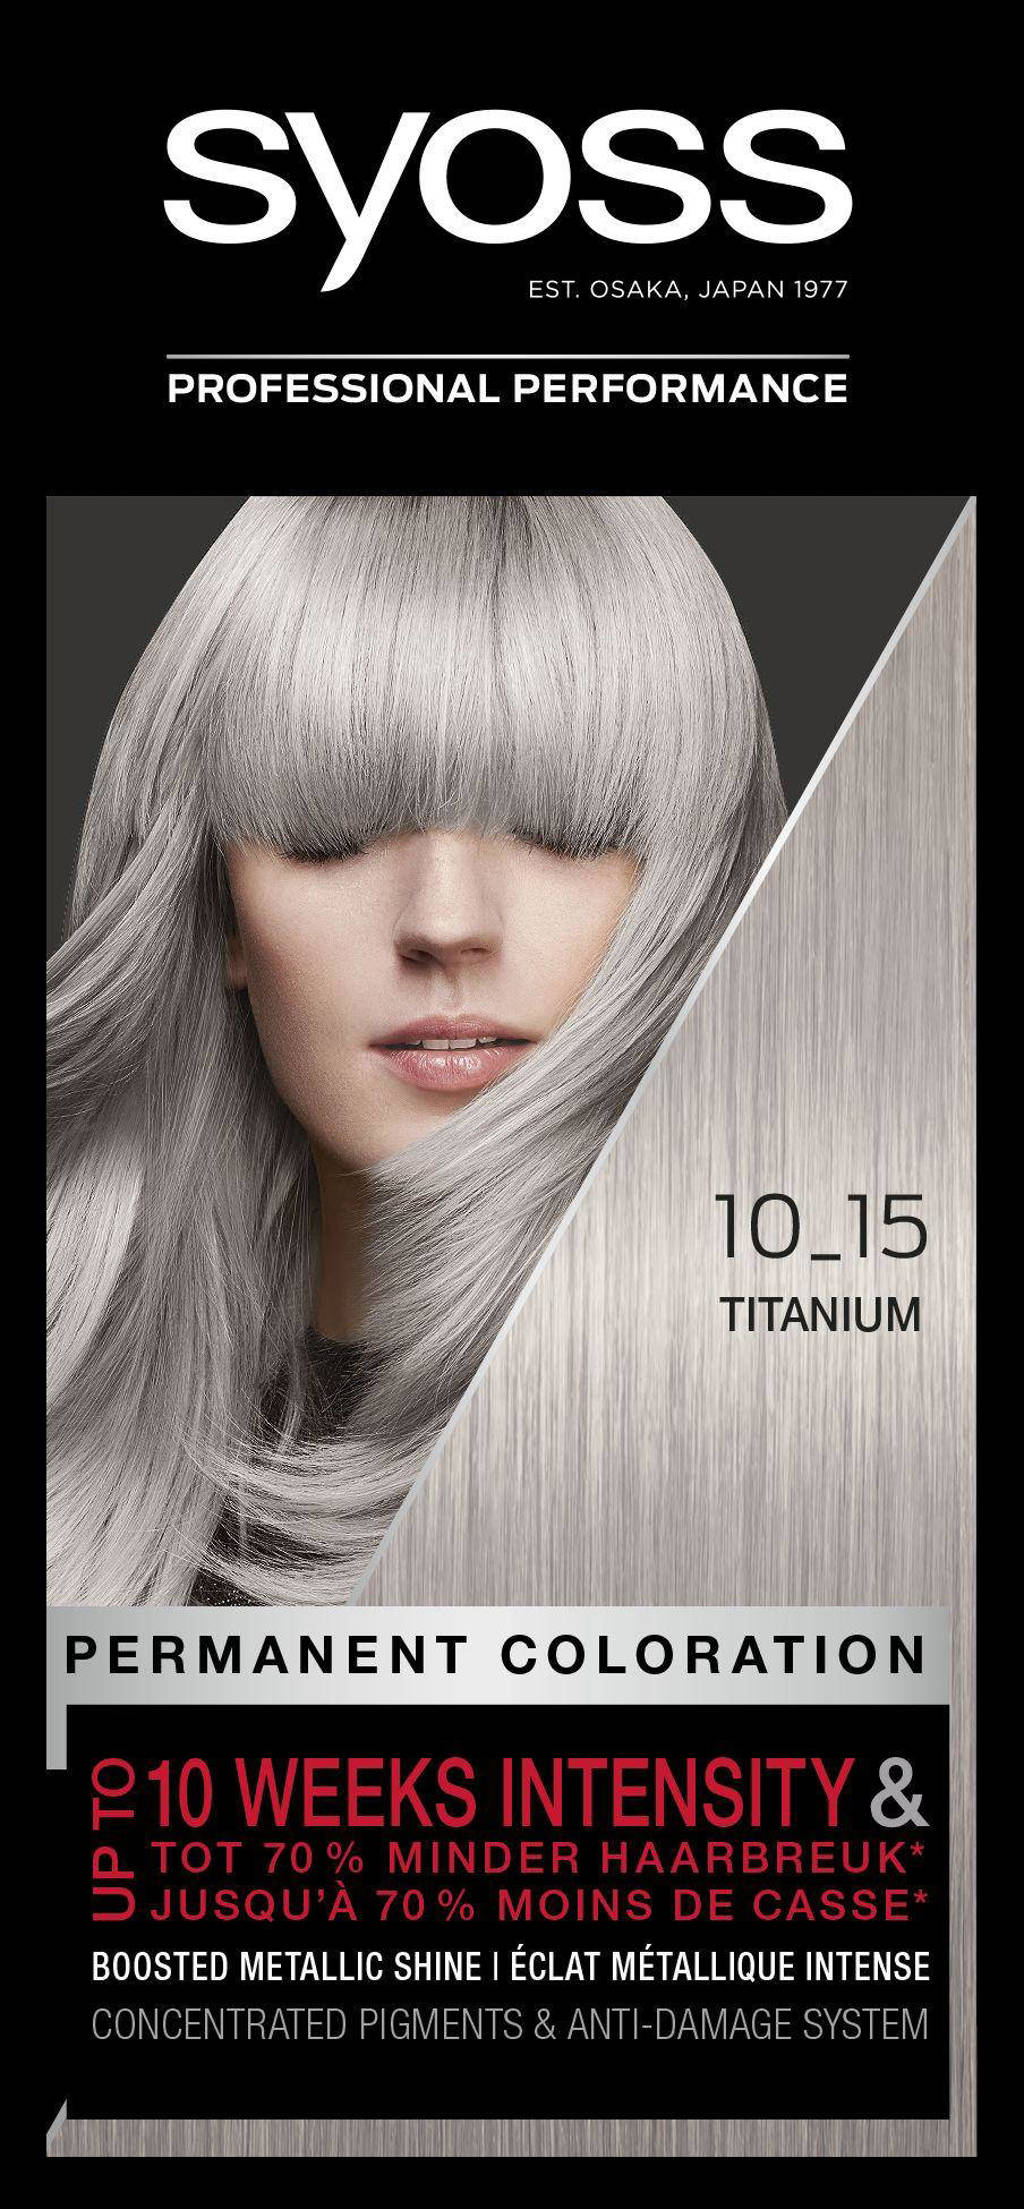 Syoss Color Baseline 10-15 Titanium